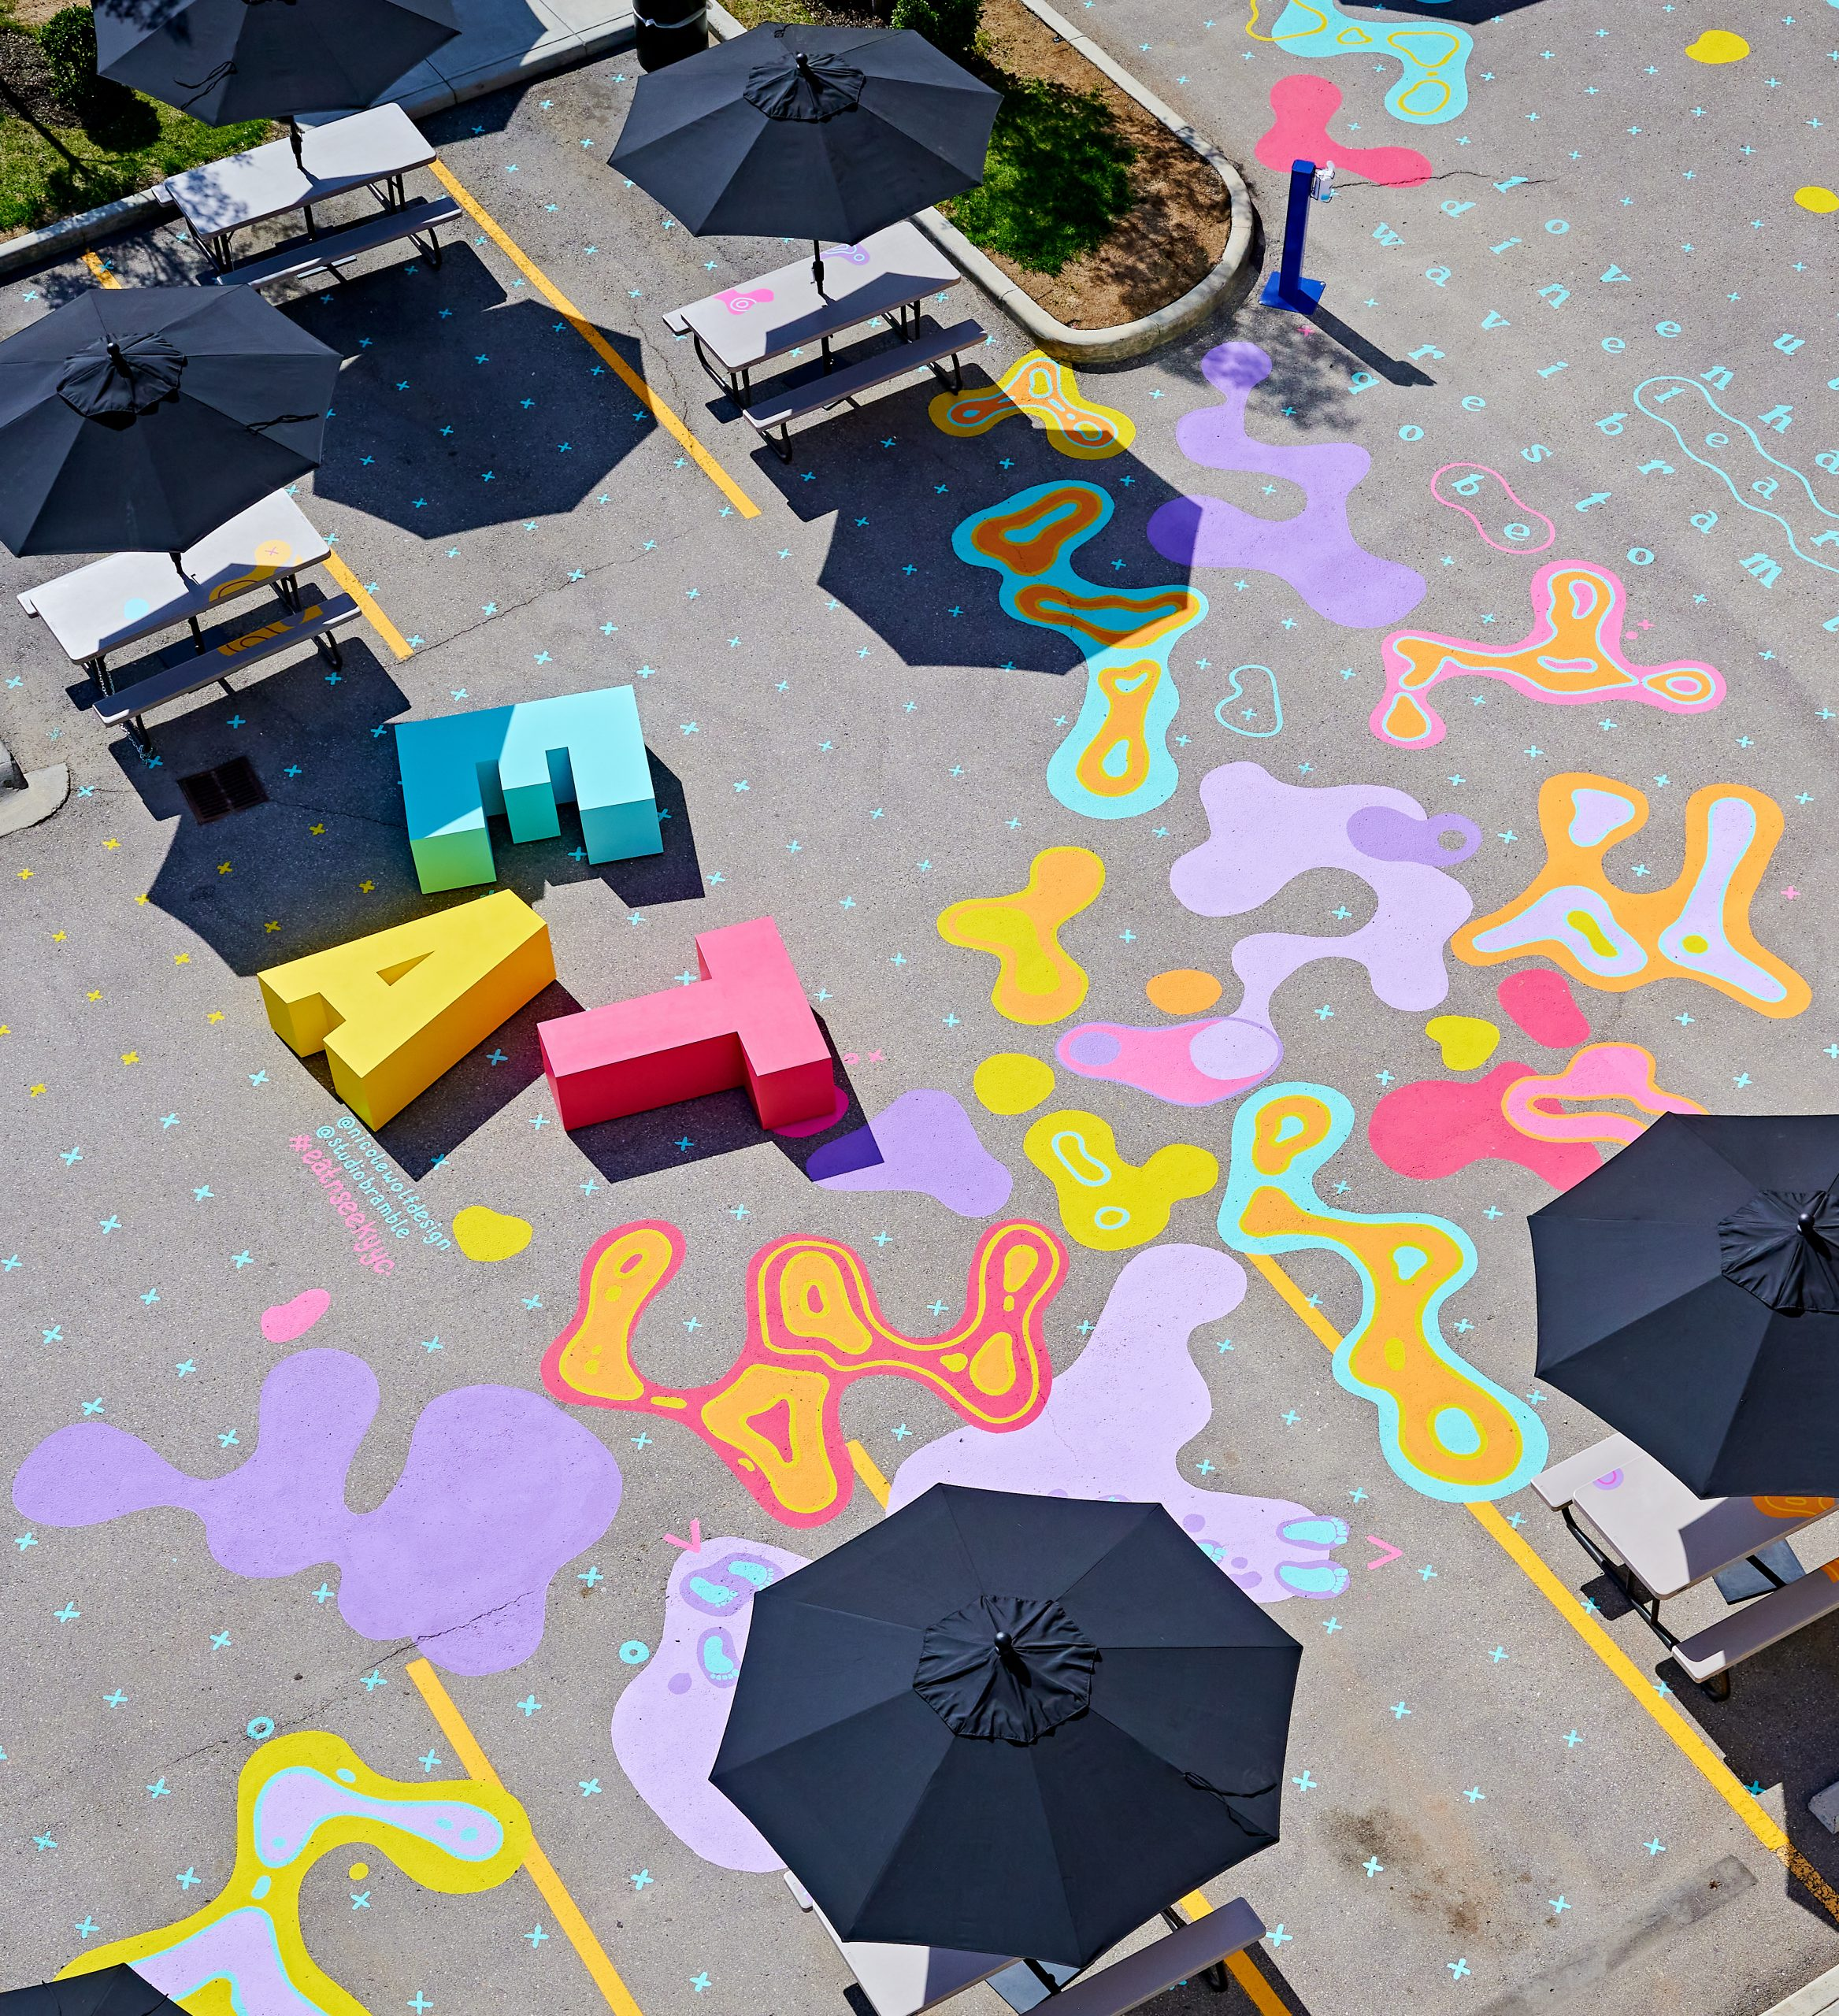 EAT bench and patio umbrellas